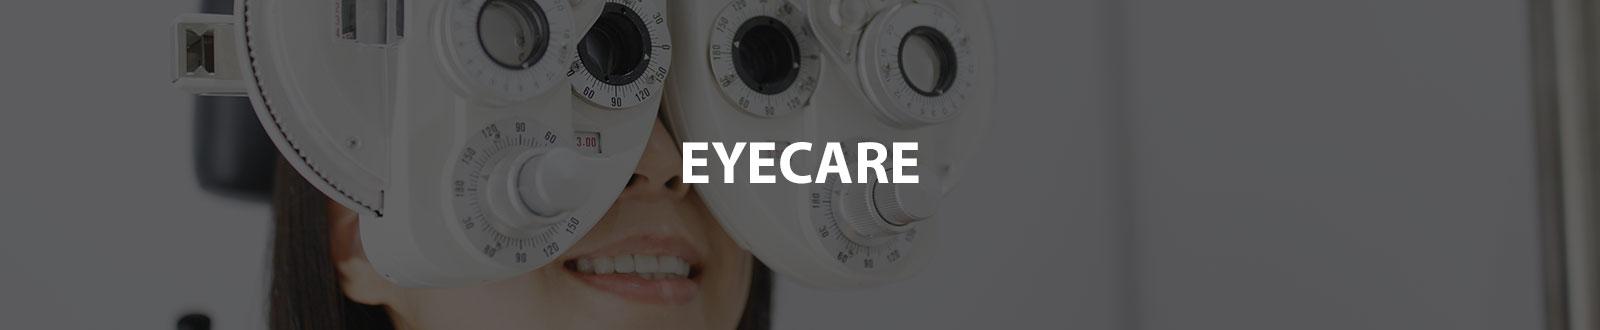 Eyecare-banner_02